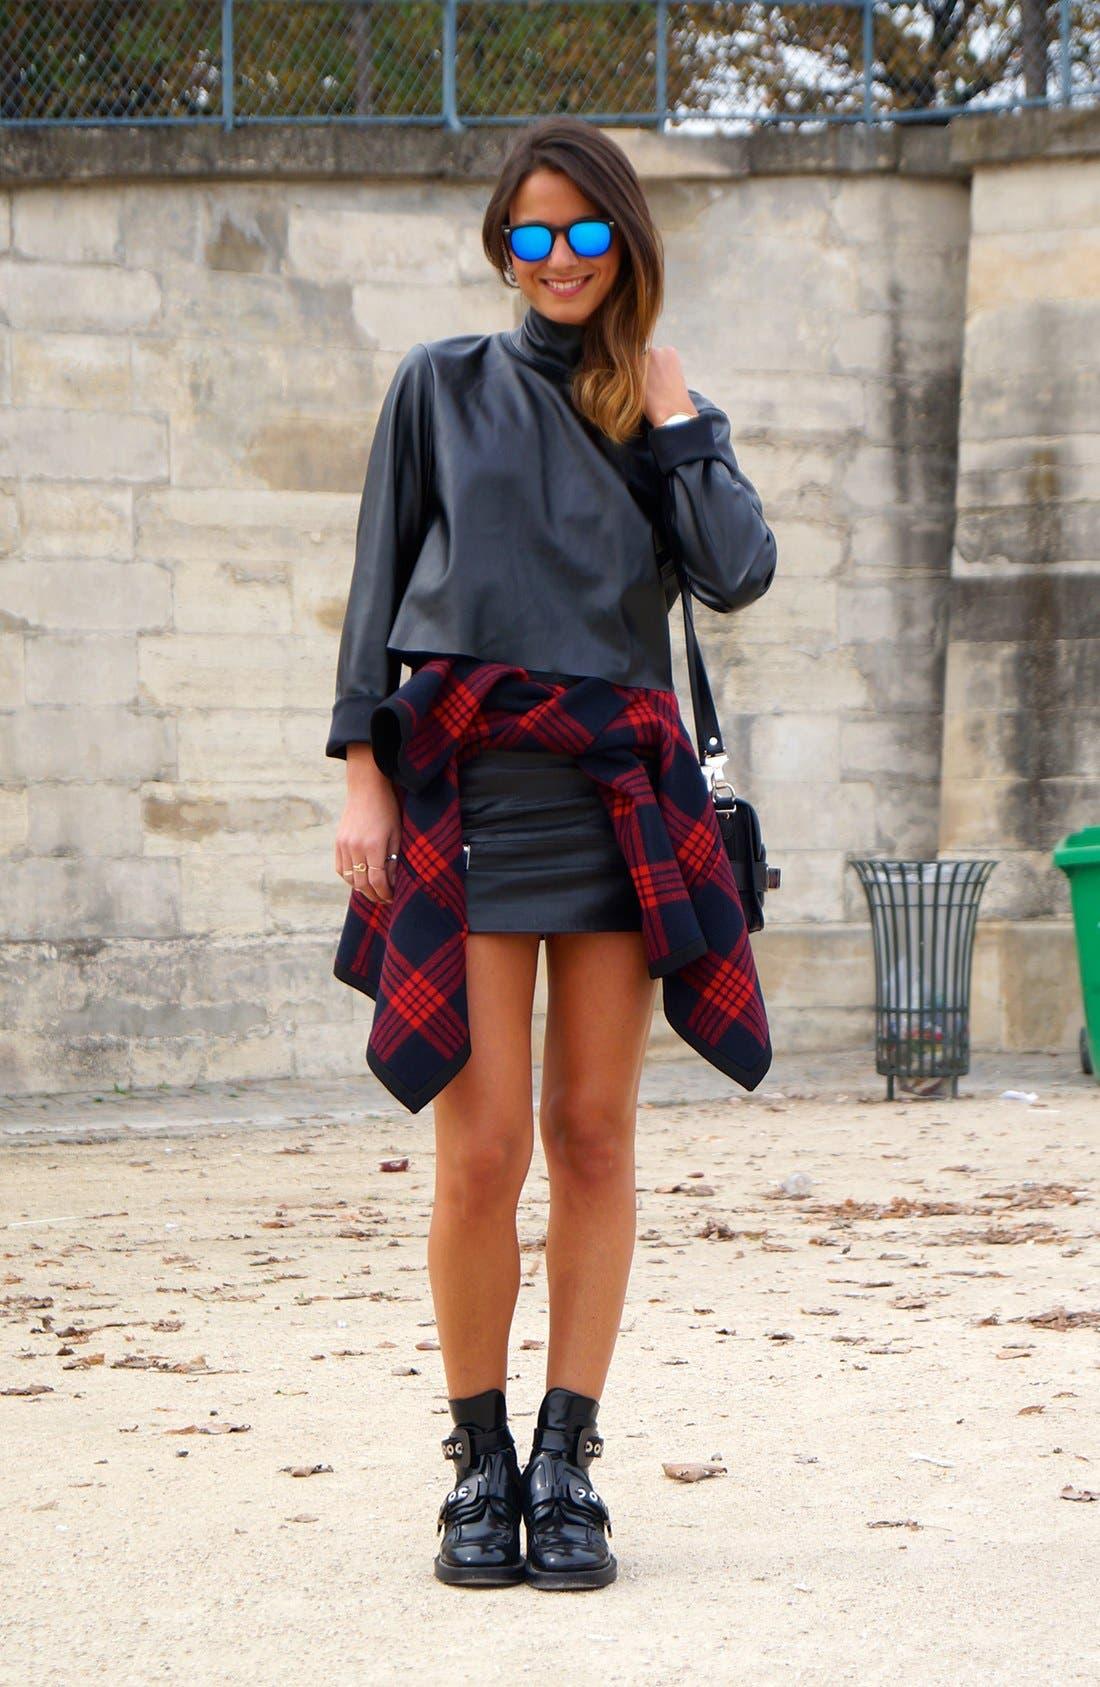 Main Image - The Leather Mini Street Style Look